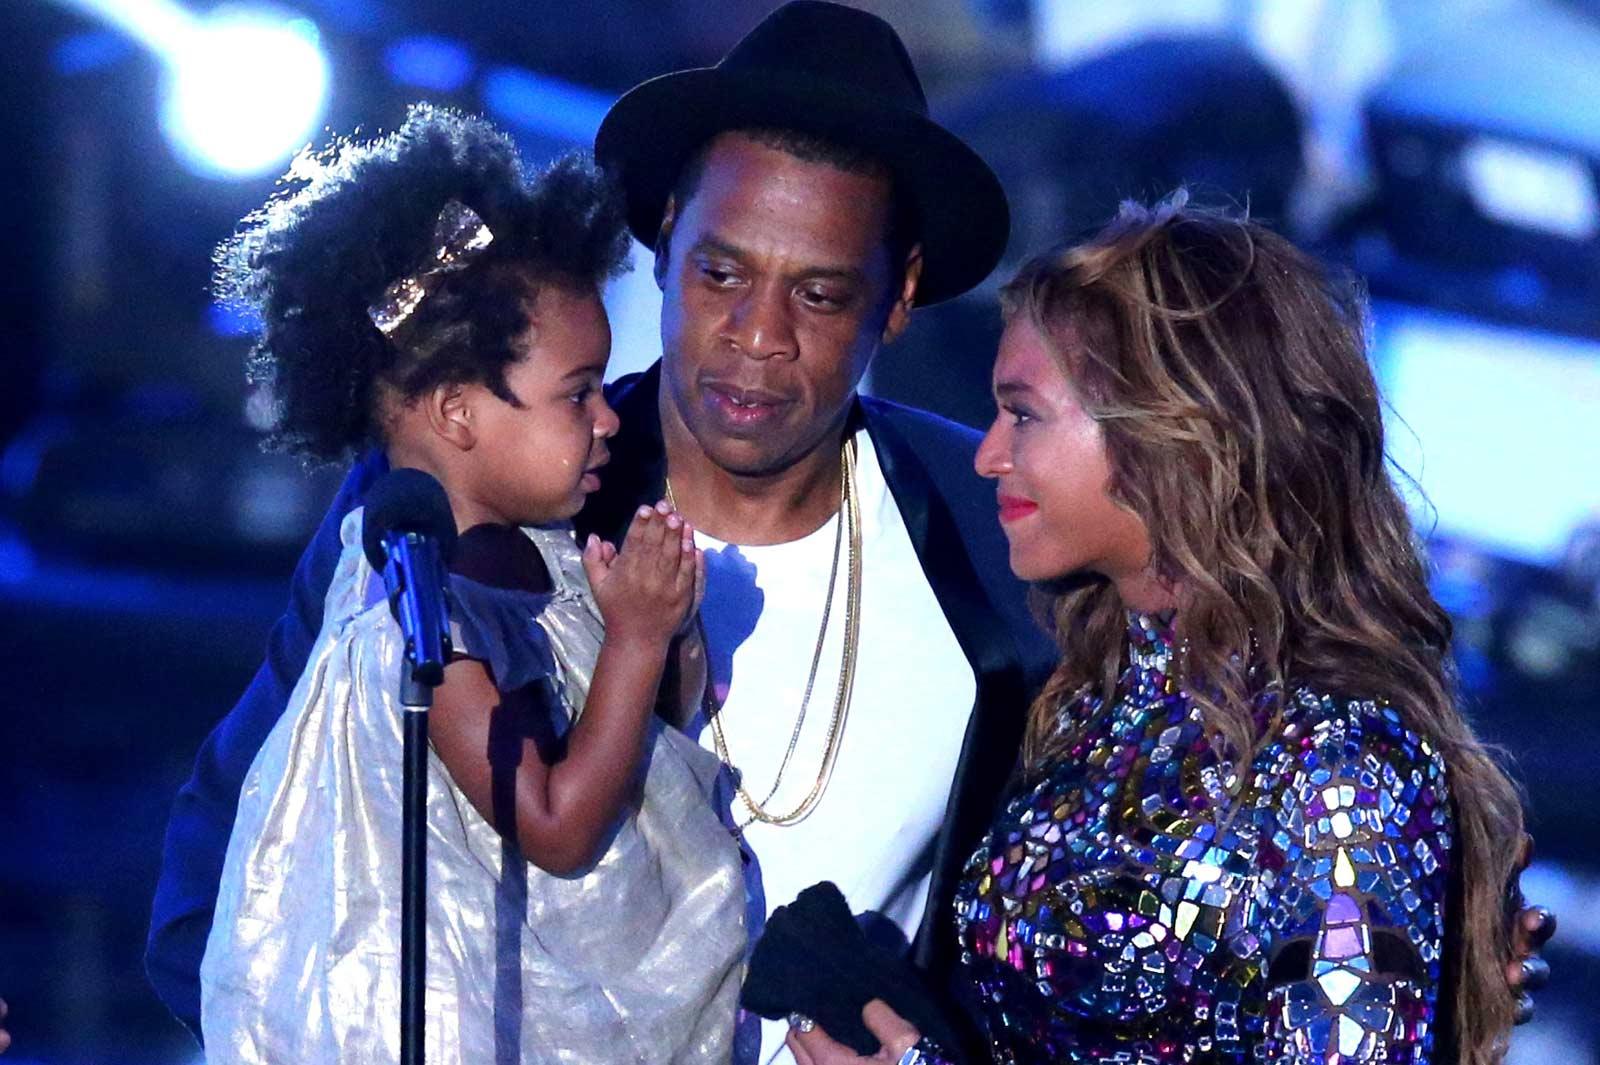 Бейонсе, Jay-Z и Блу Айви на сцене. Фото: popcrush.com